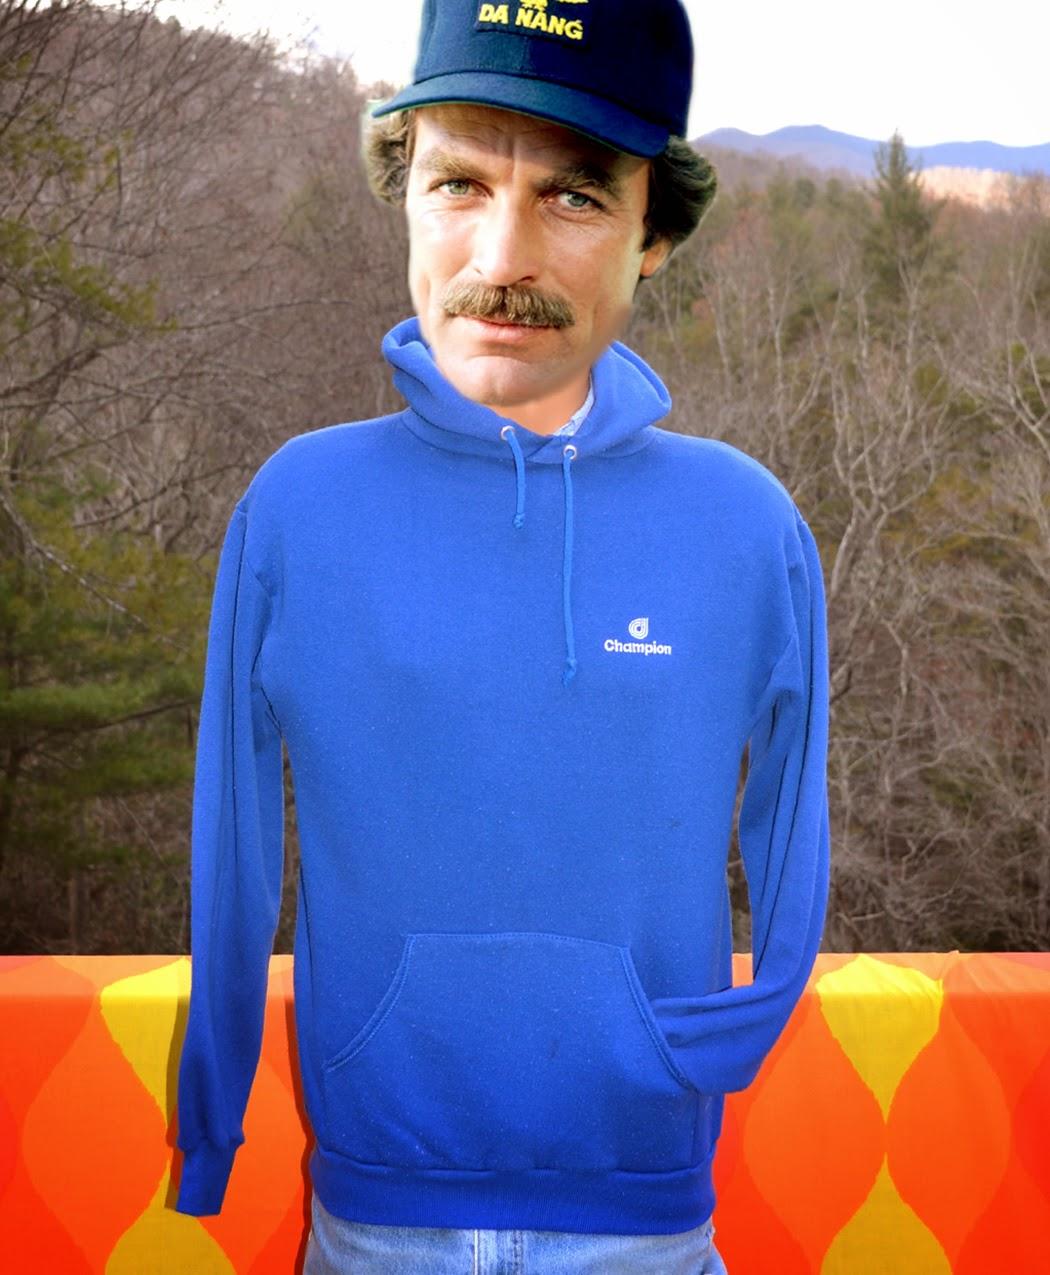 https://www.etsy.com/listing/214002054/80s-vintage-hoody-sweatshirt-champion